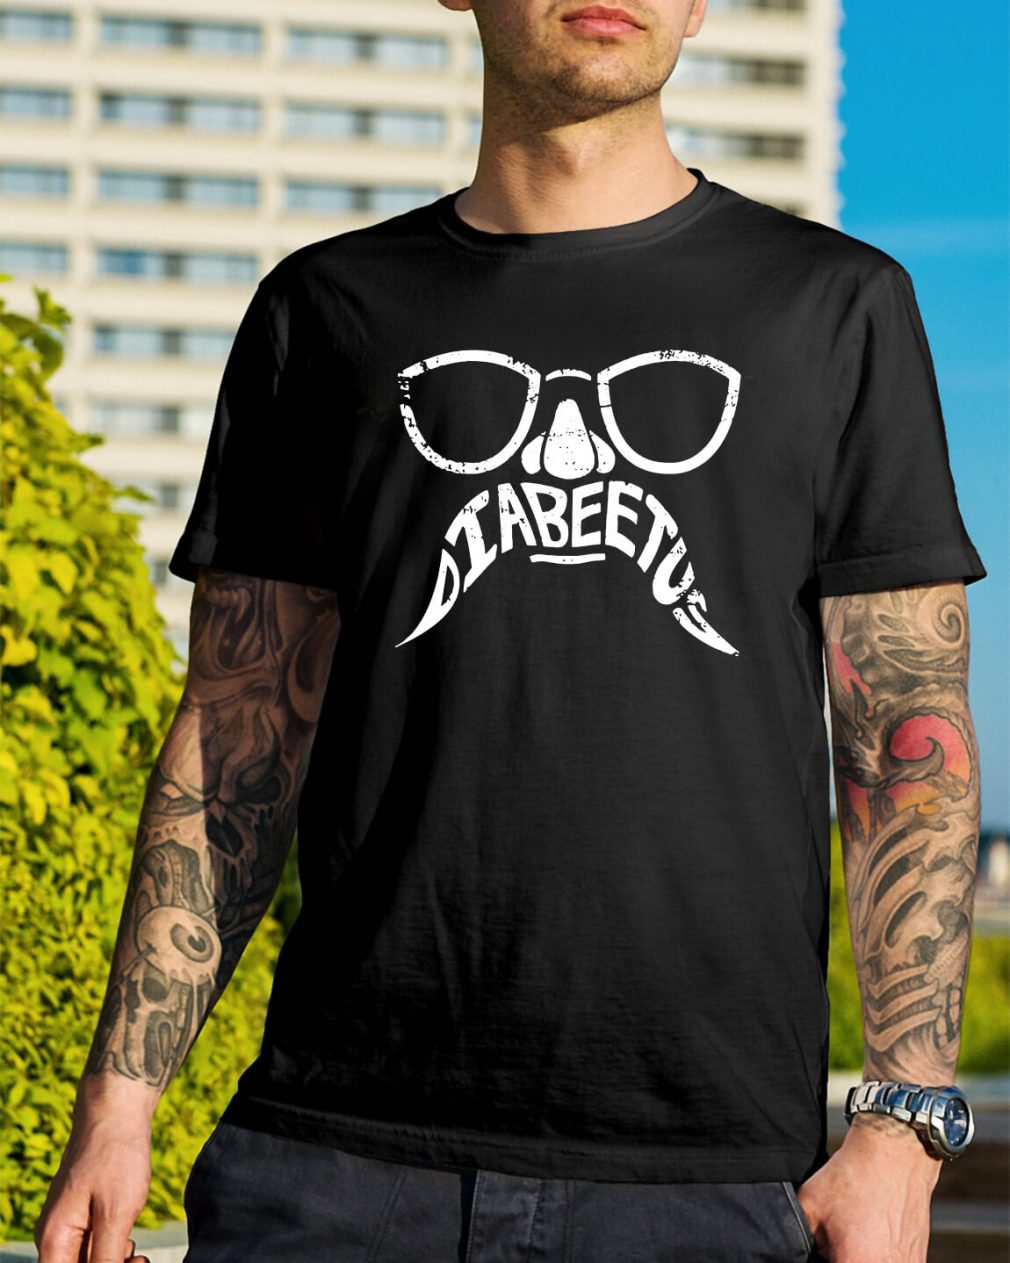 Official Diabeetus shirt